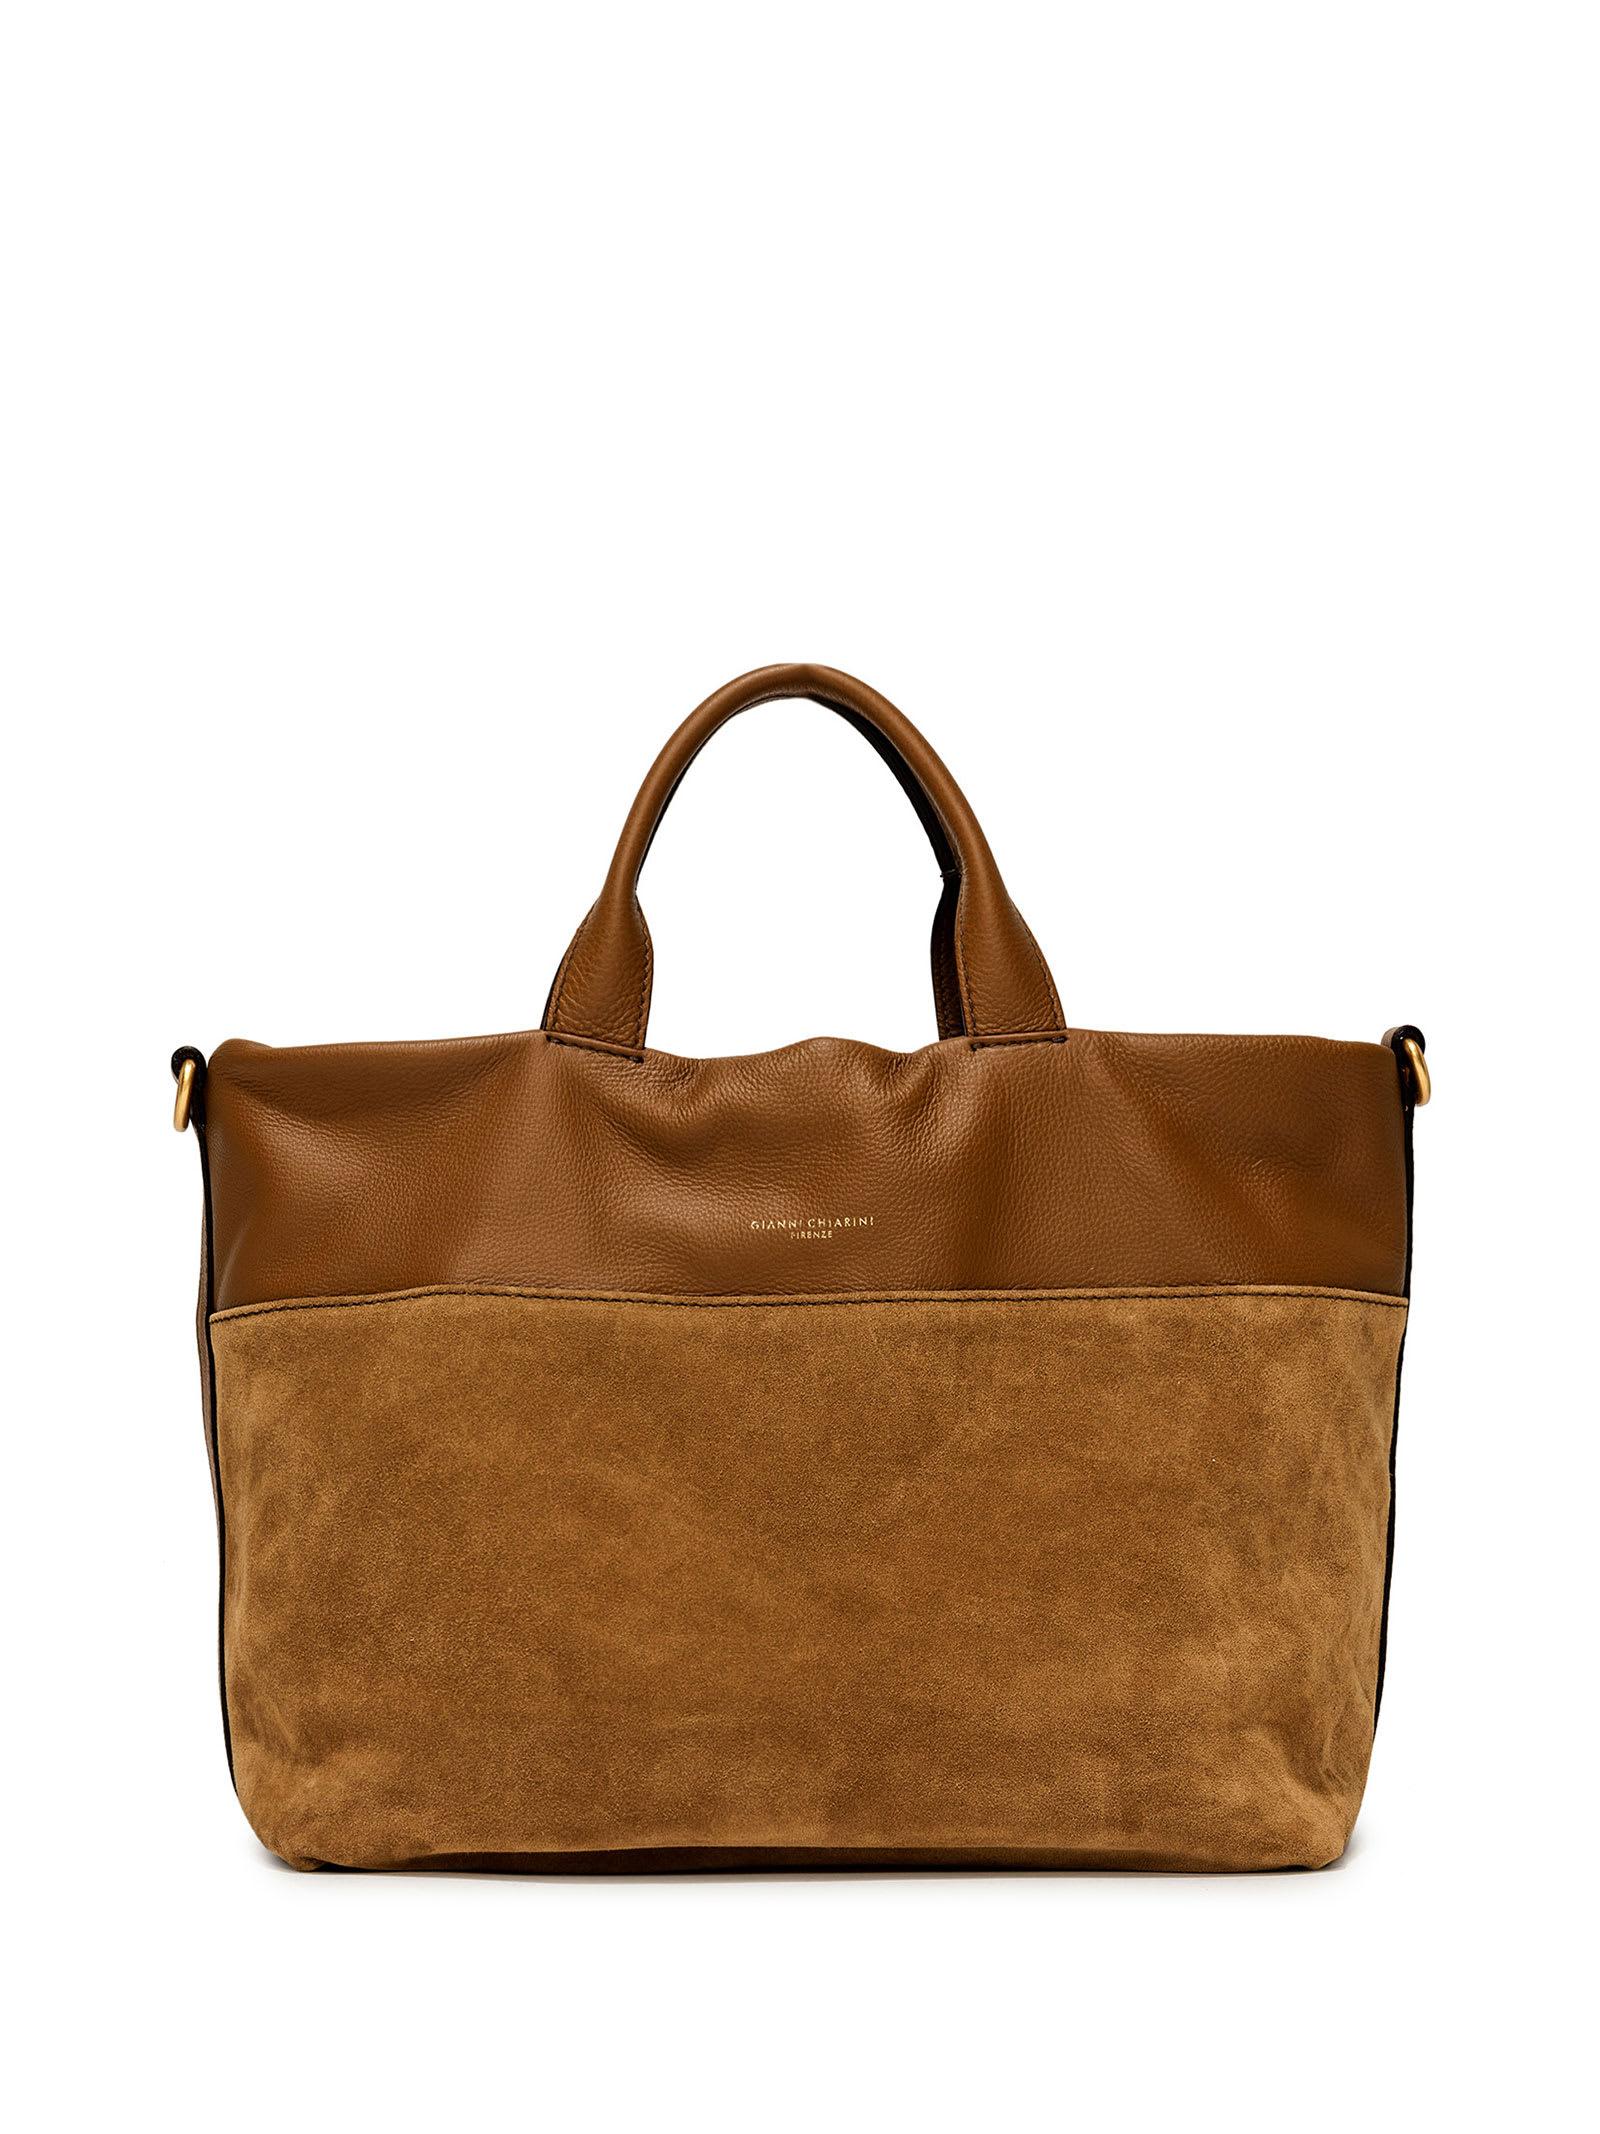 Tan Shopping Bag